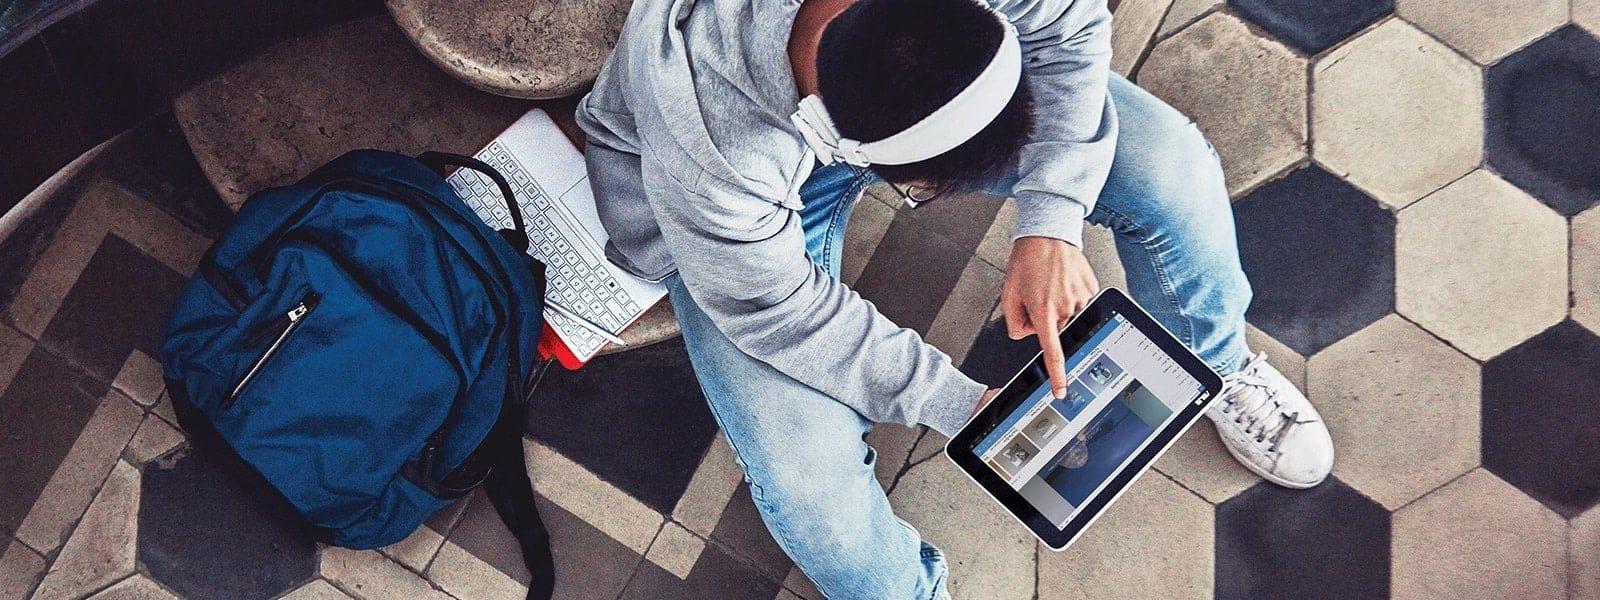 Windows 10 cihazına bakan öğrenci